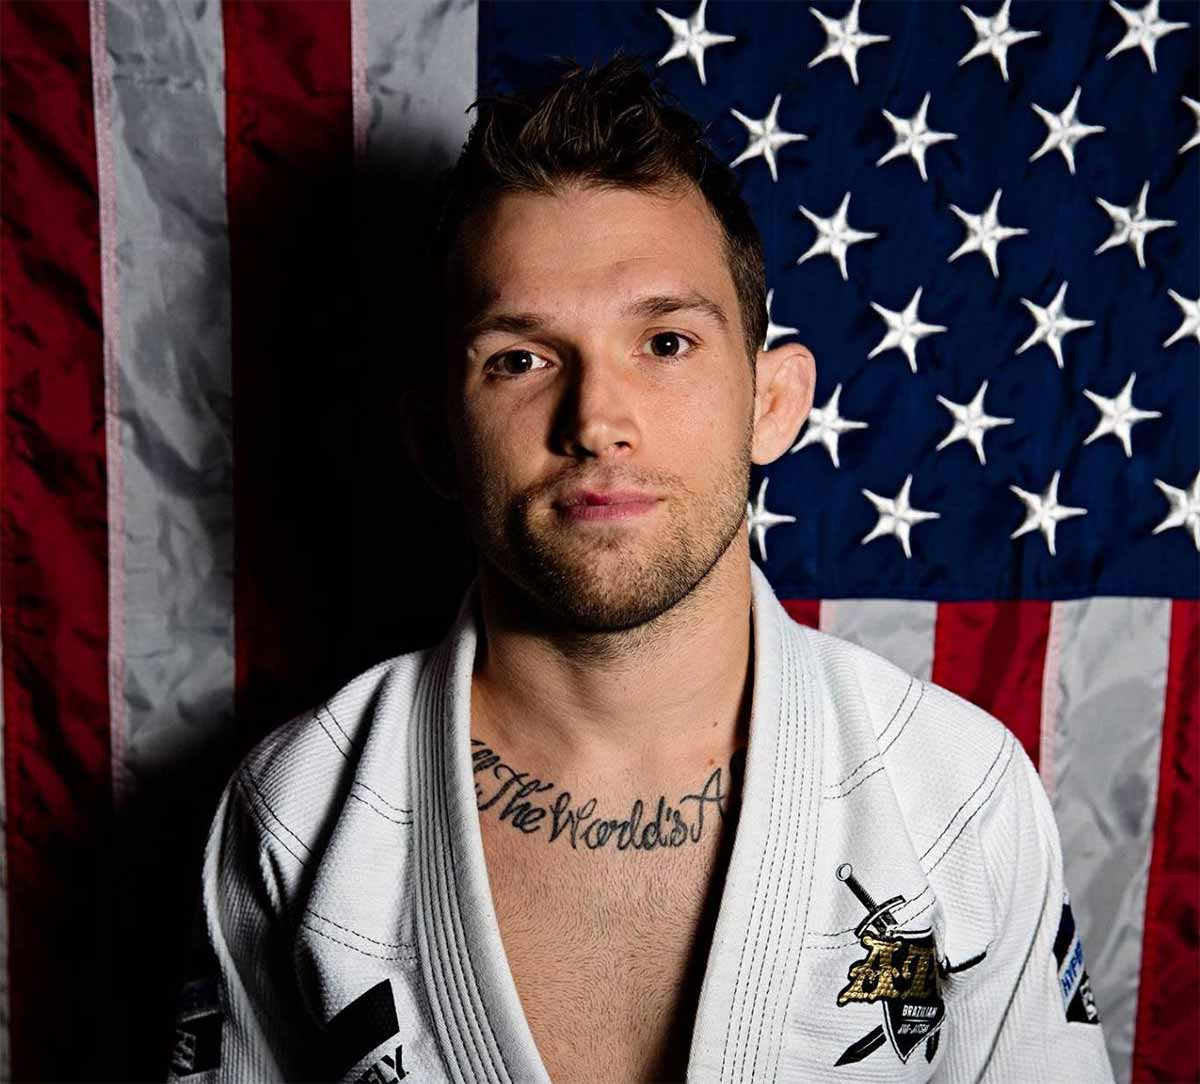 Photo: Atos Black Belt Kristian Woodmansee